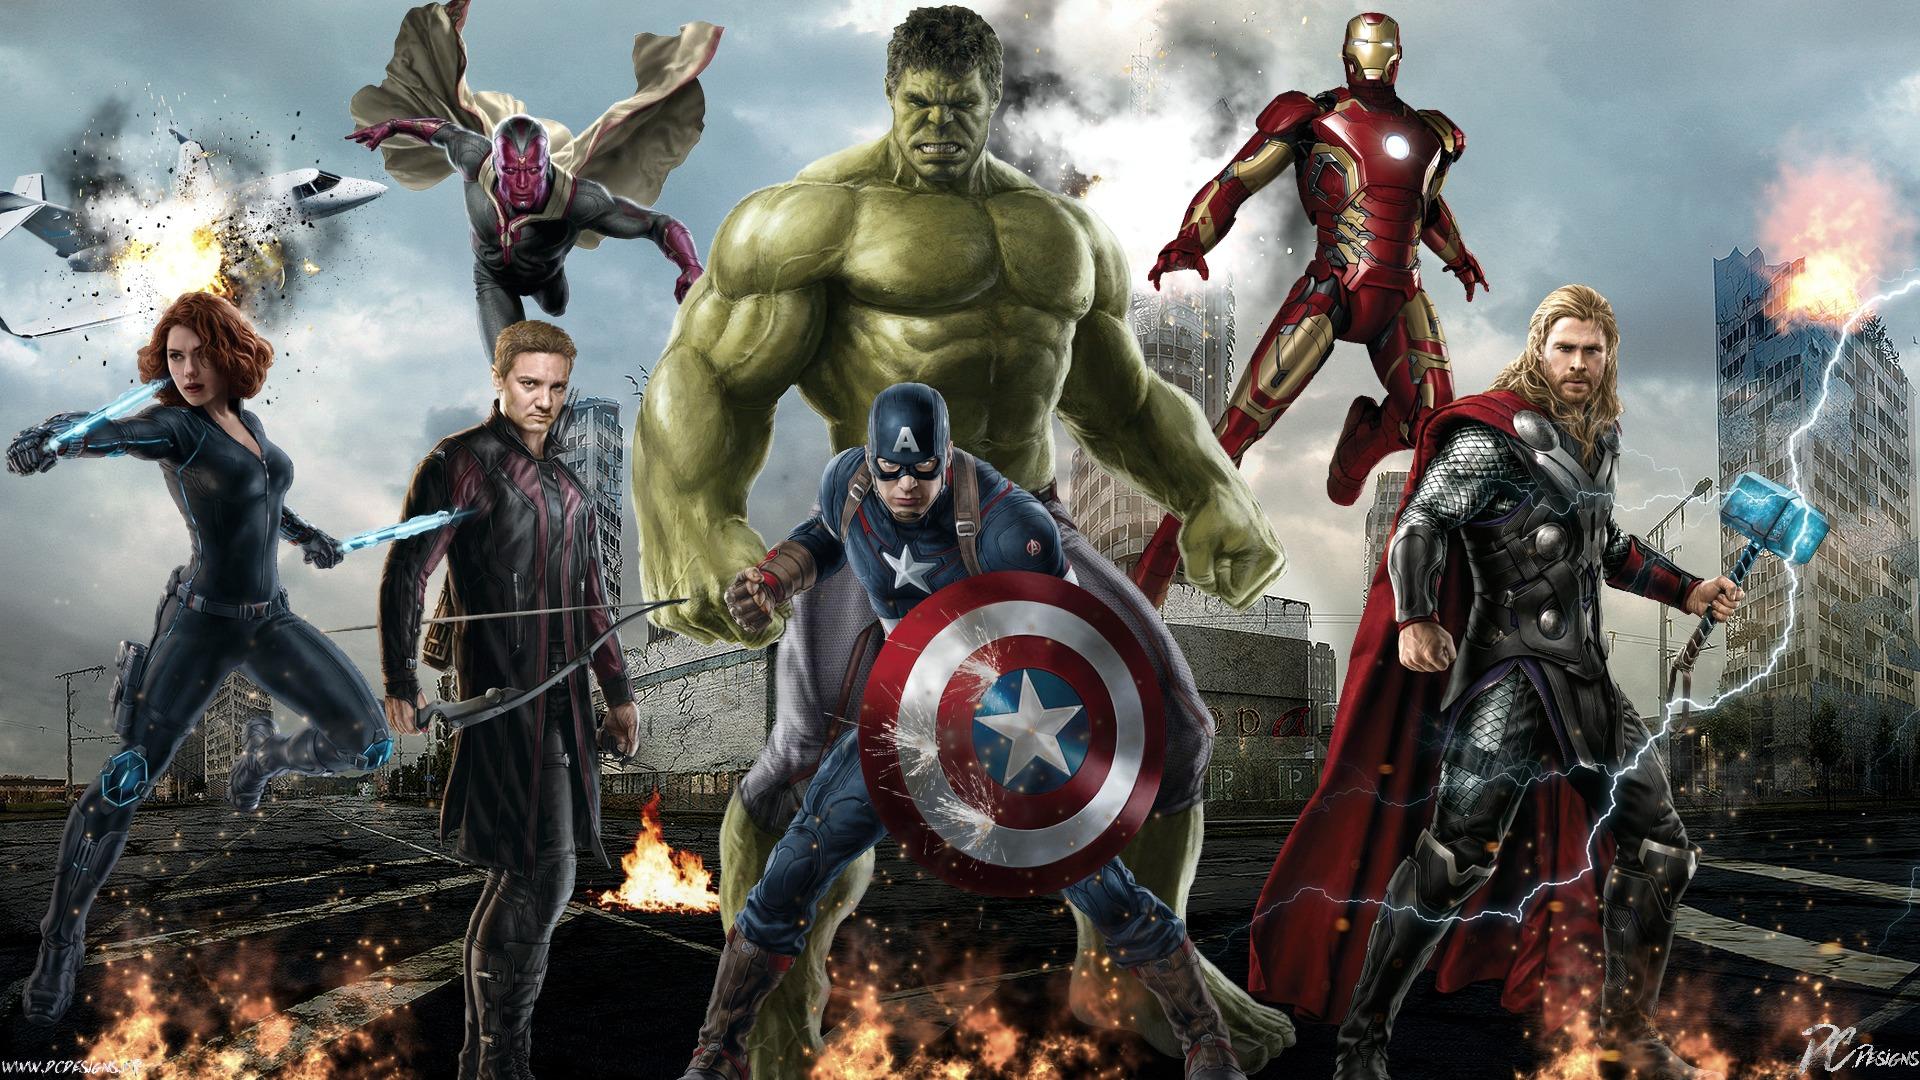 Chris Hemsworth: Avengers, Black Widow, Captain America, Chris Evans, Кріс Хемсворт, Hawkeye, Hulk, Iron Man, Jeremy Renner, Scarlett Johansson, Thor, Avengers: Age of Ultron, Fan Art, Marvel Comics, Vision, Poster